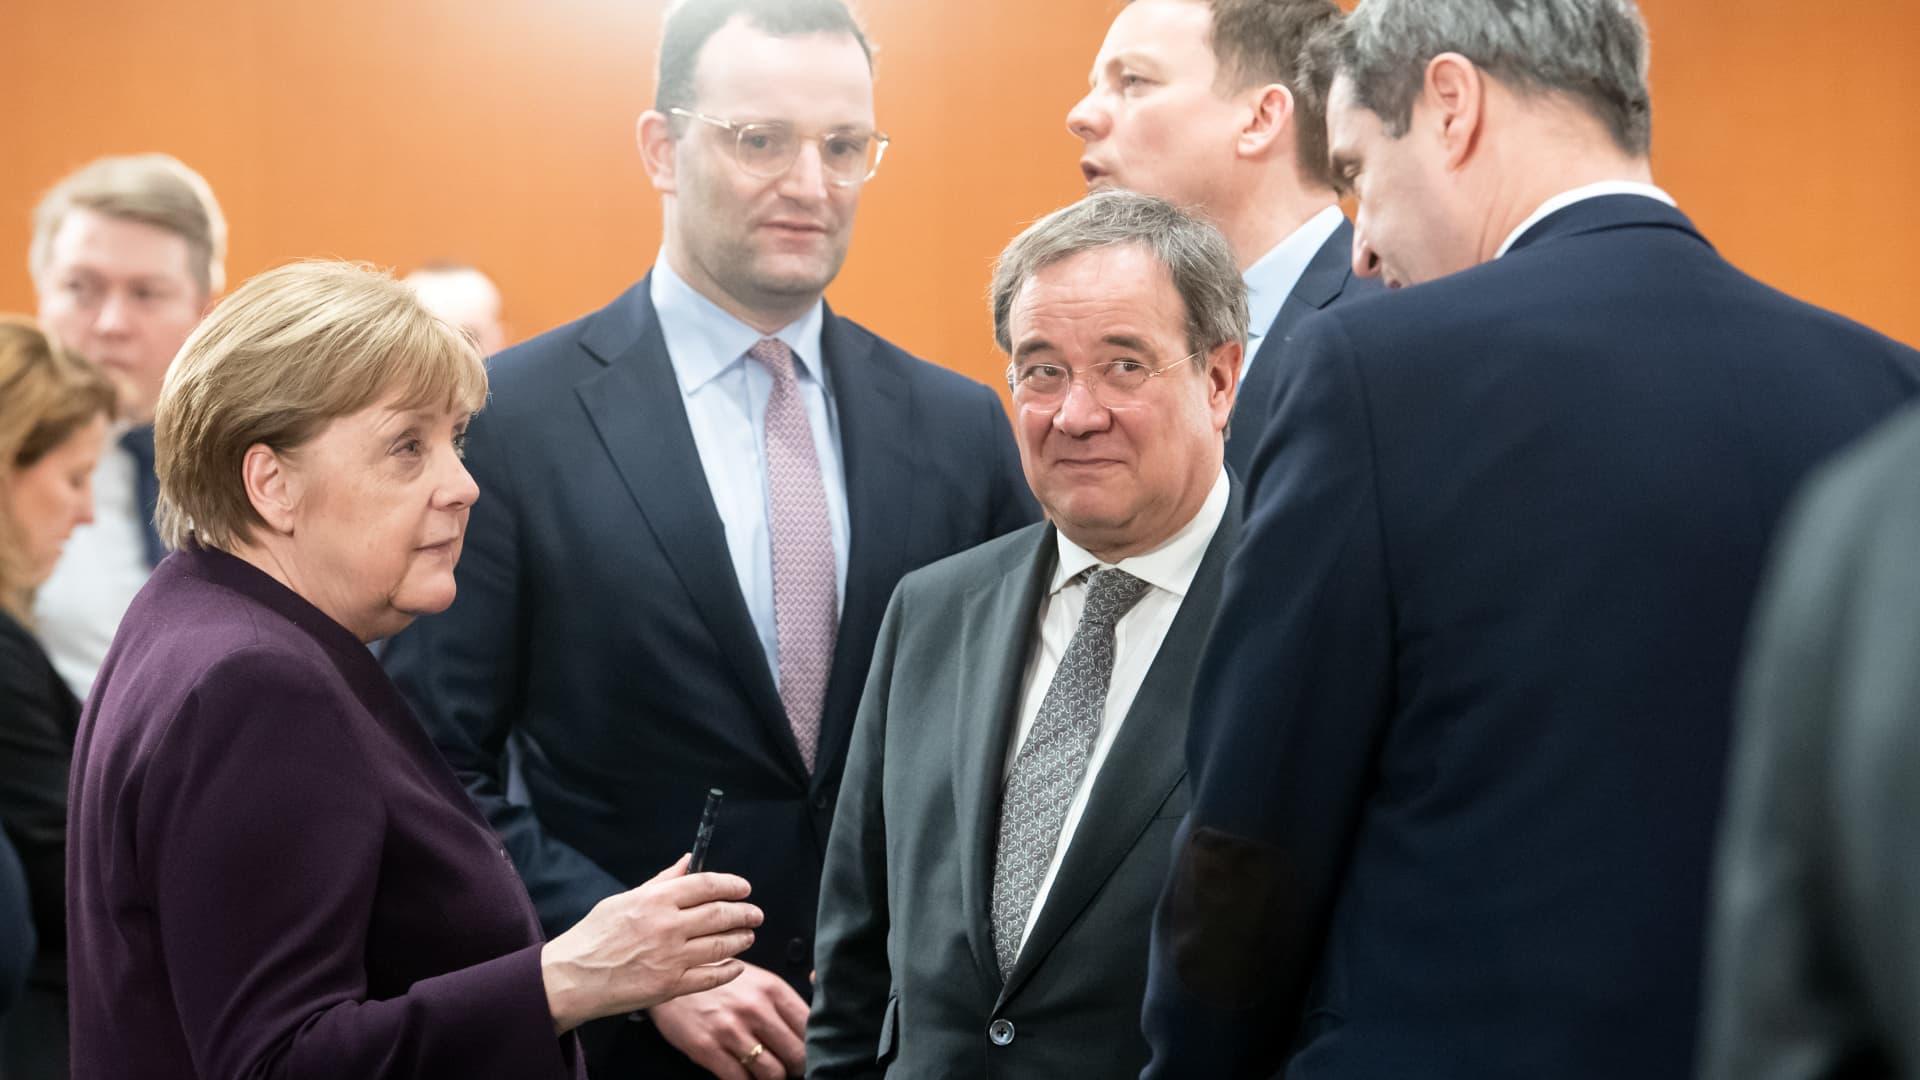 Angela Merkel (CDU,l-r), Armin Laschet (CDU), Prime Minister of North Rhine-Westphalia, and Markus Söder (CSU), Prime Minister of Bavaria, talk to the heads of state governments.